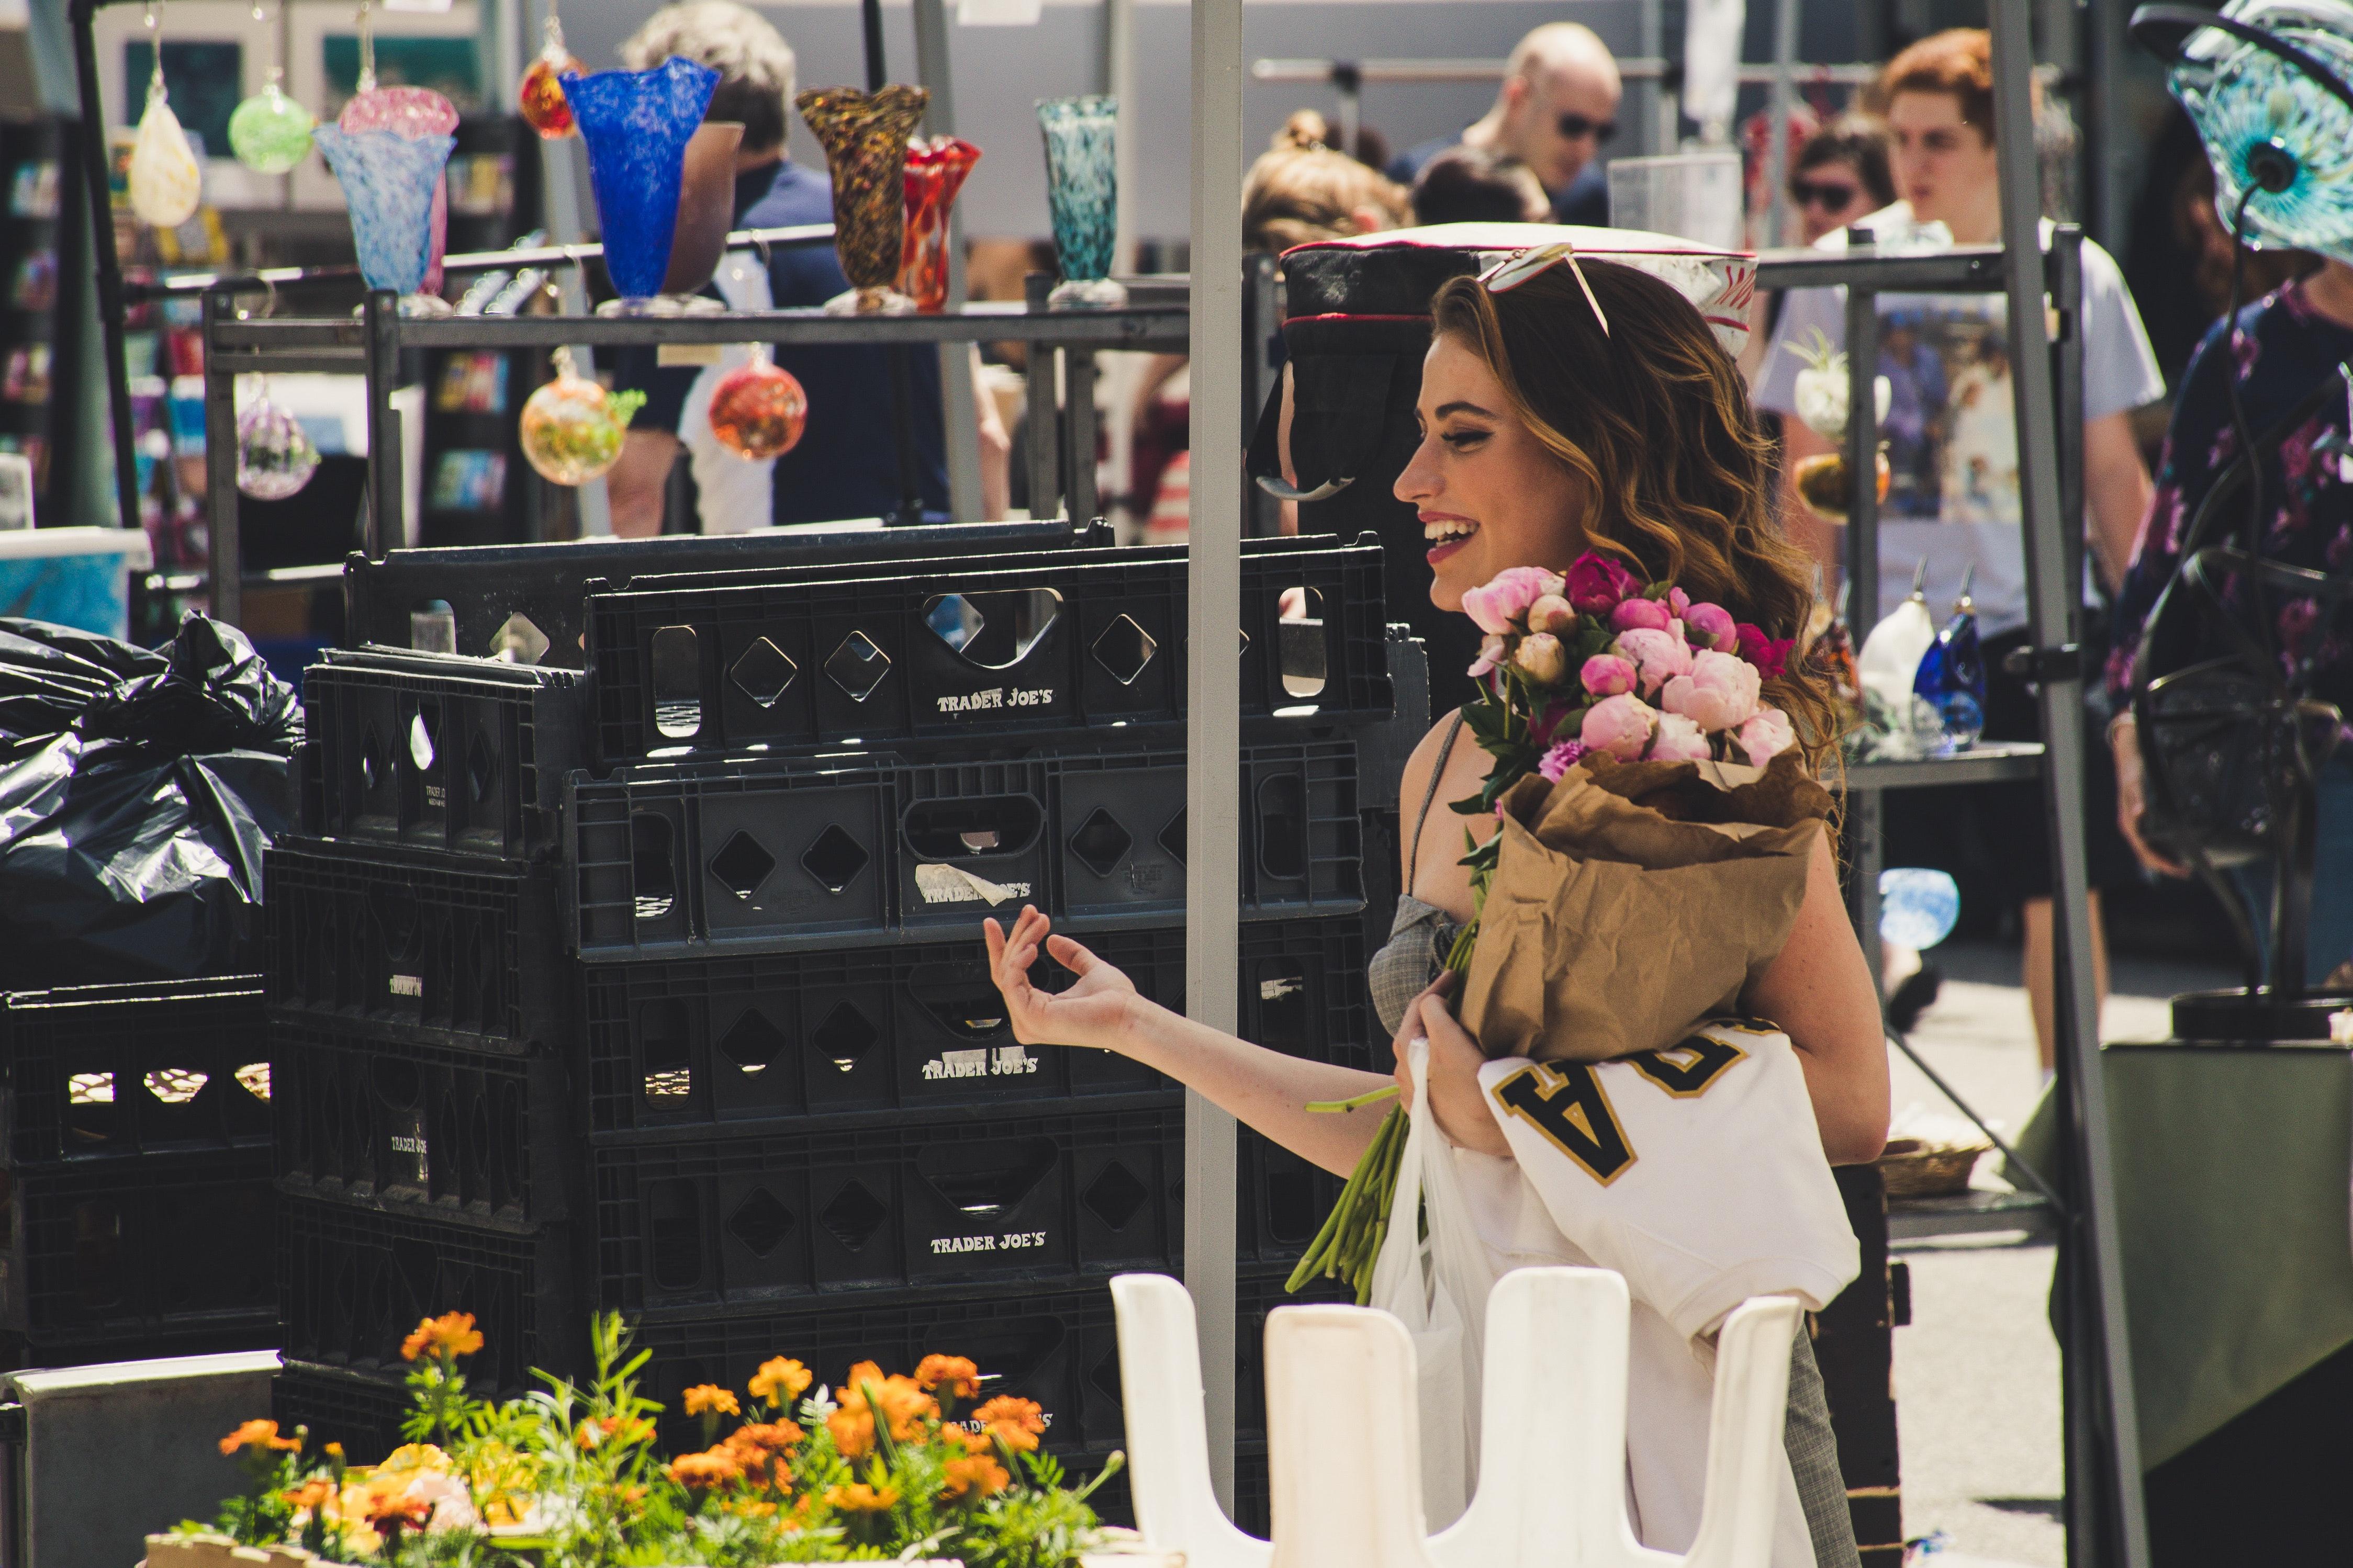 Image of a woman shopping at a flea market